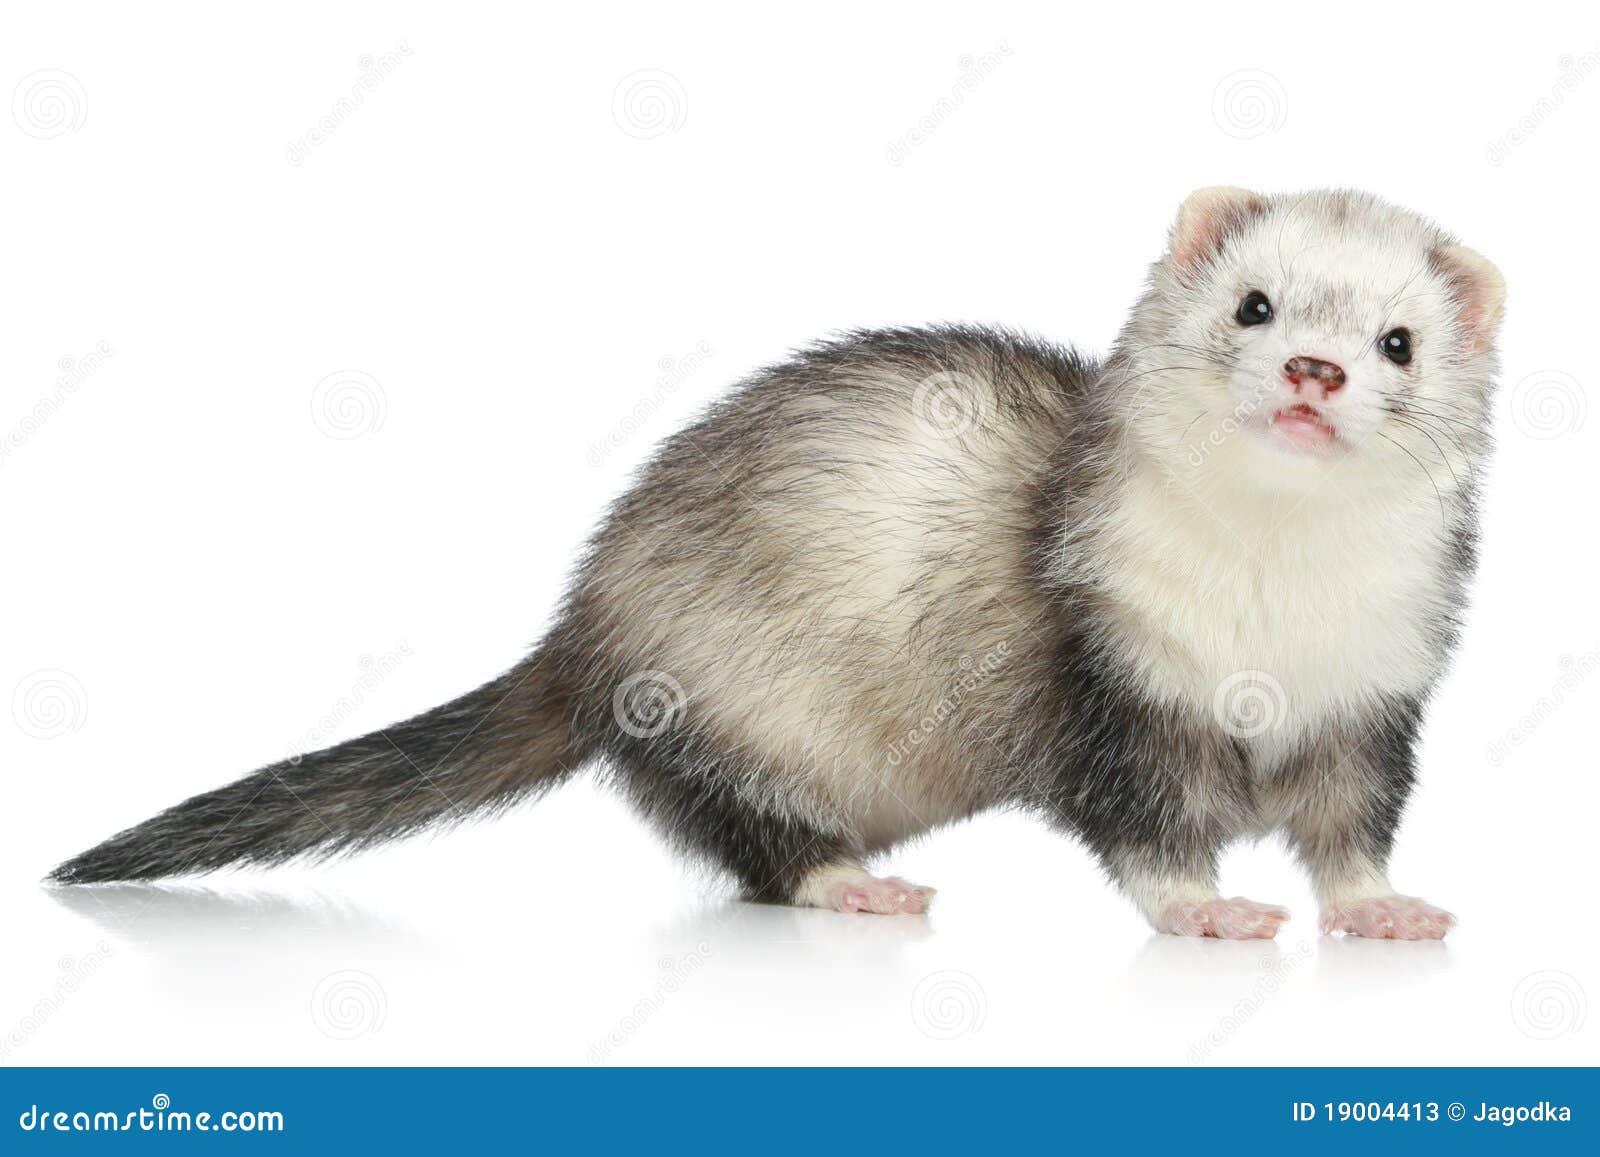 Ferret On A White Background Stock Photos Image 19004413